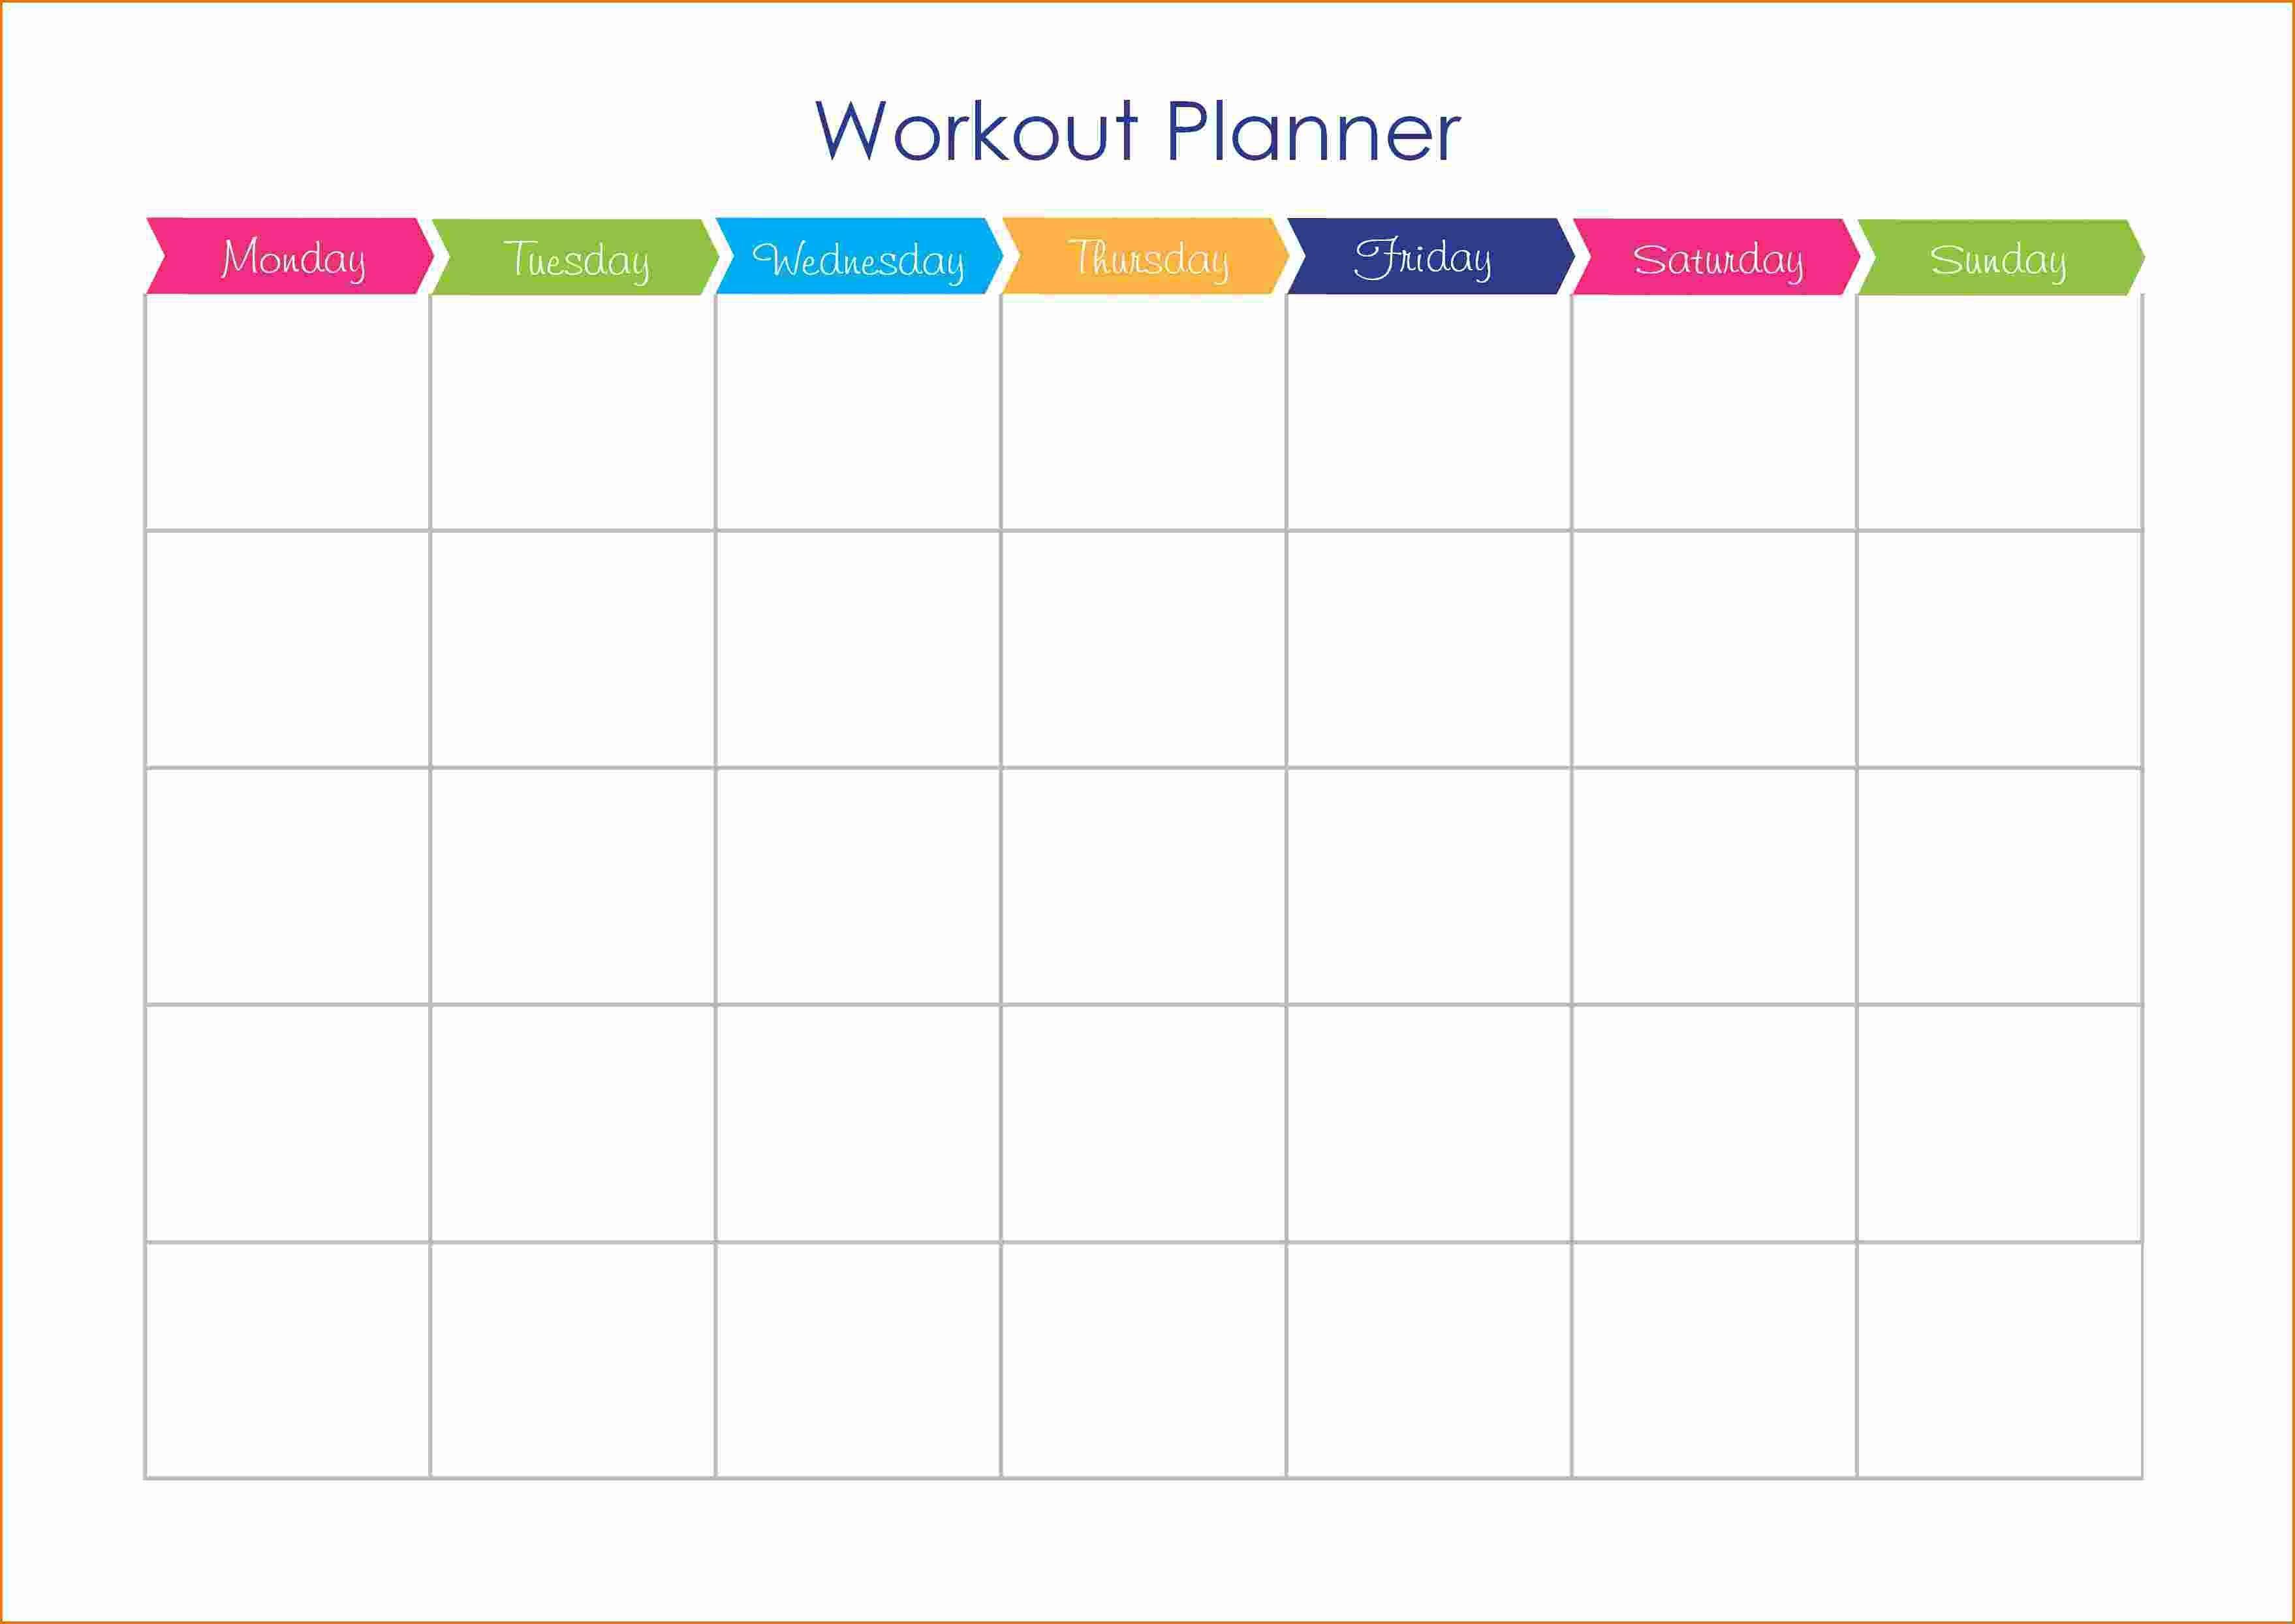 001 Shocking Weekly Workout Schedule Template Inspiration  12 Week Plan Training CalendarFull